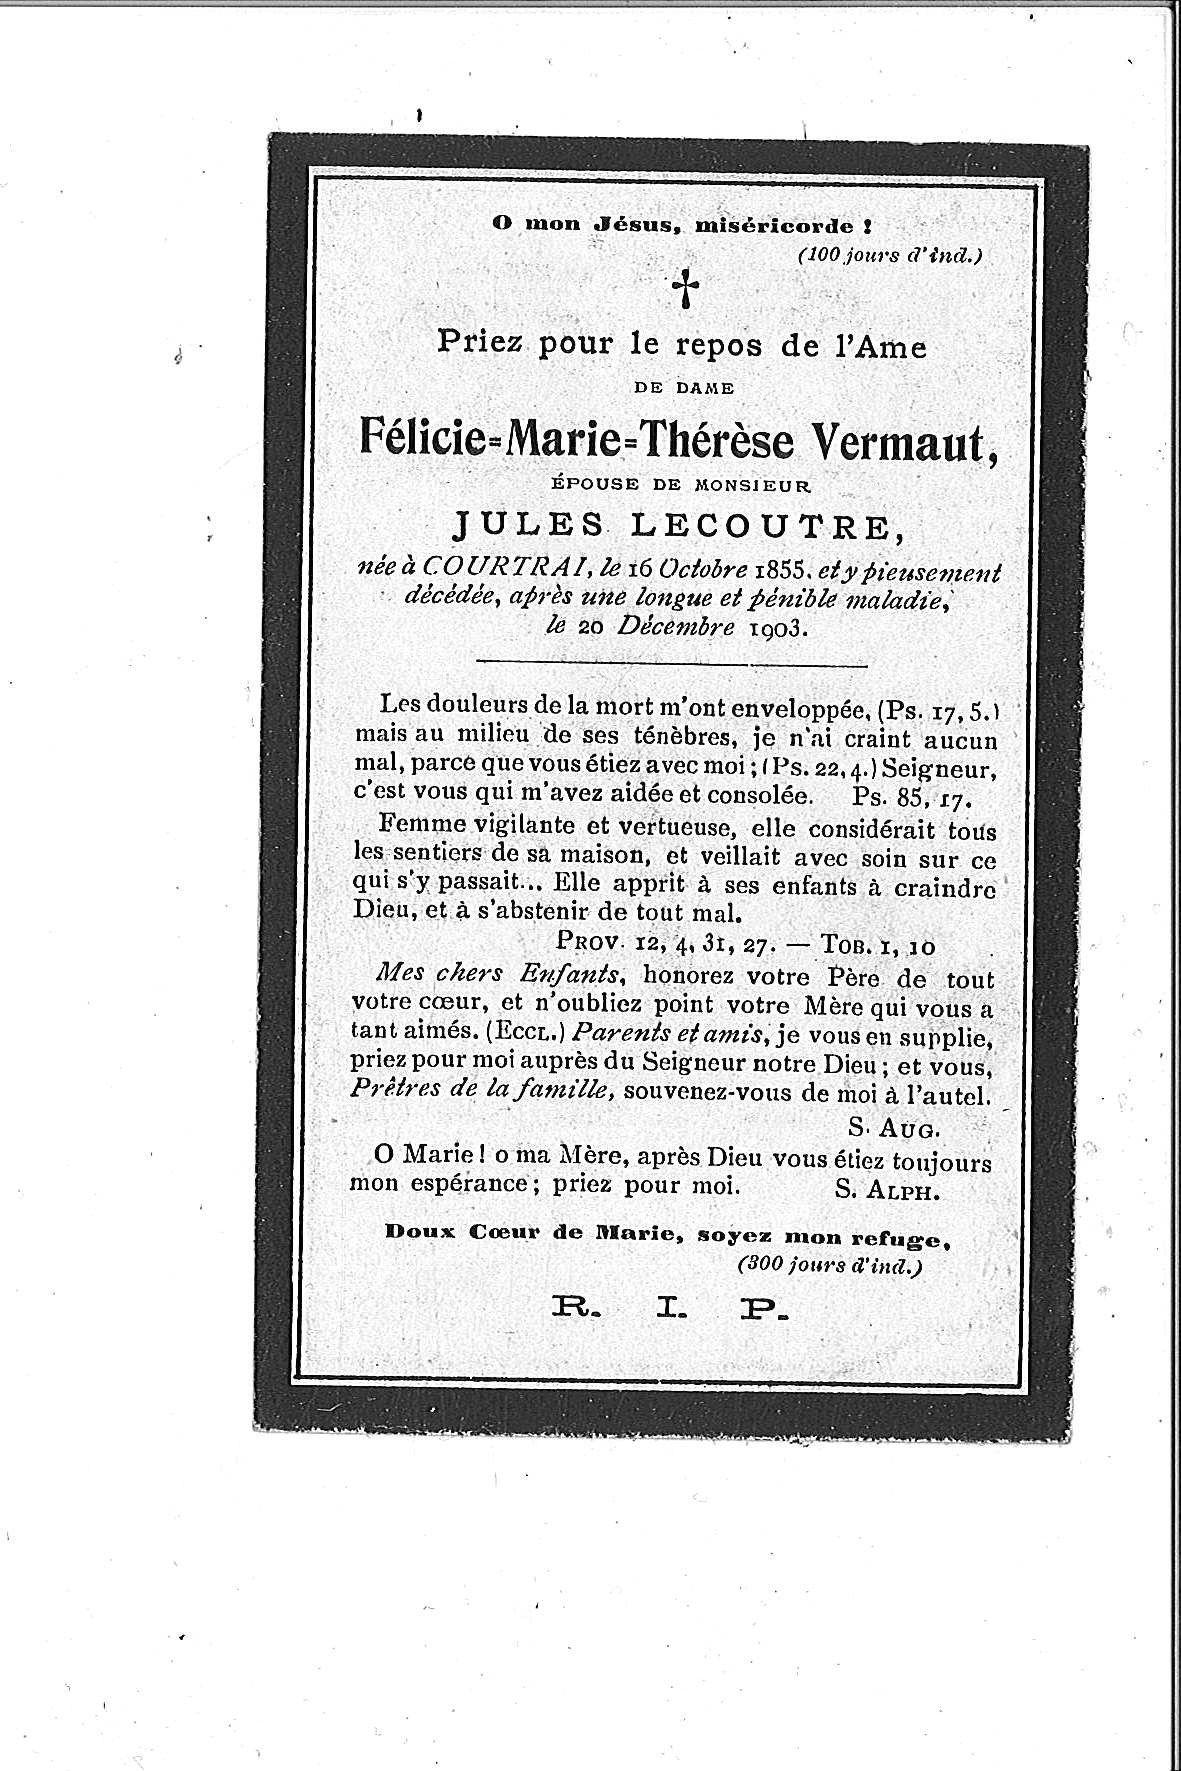 Felicie-Marie-Therese(1903)20141210102121_00013.jpg